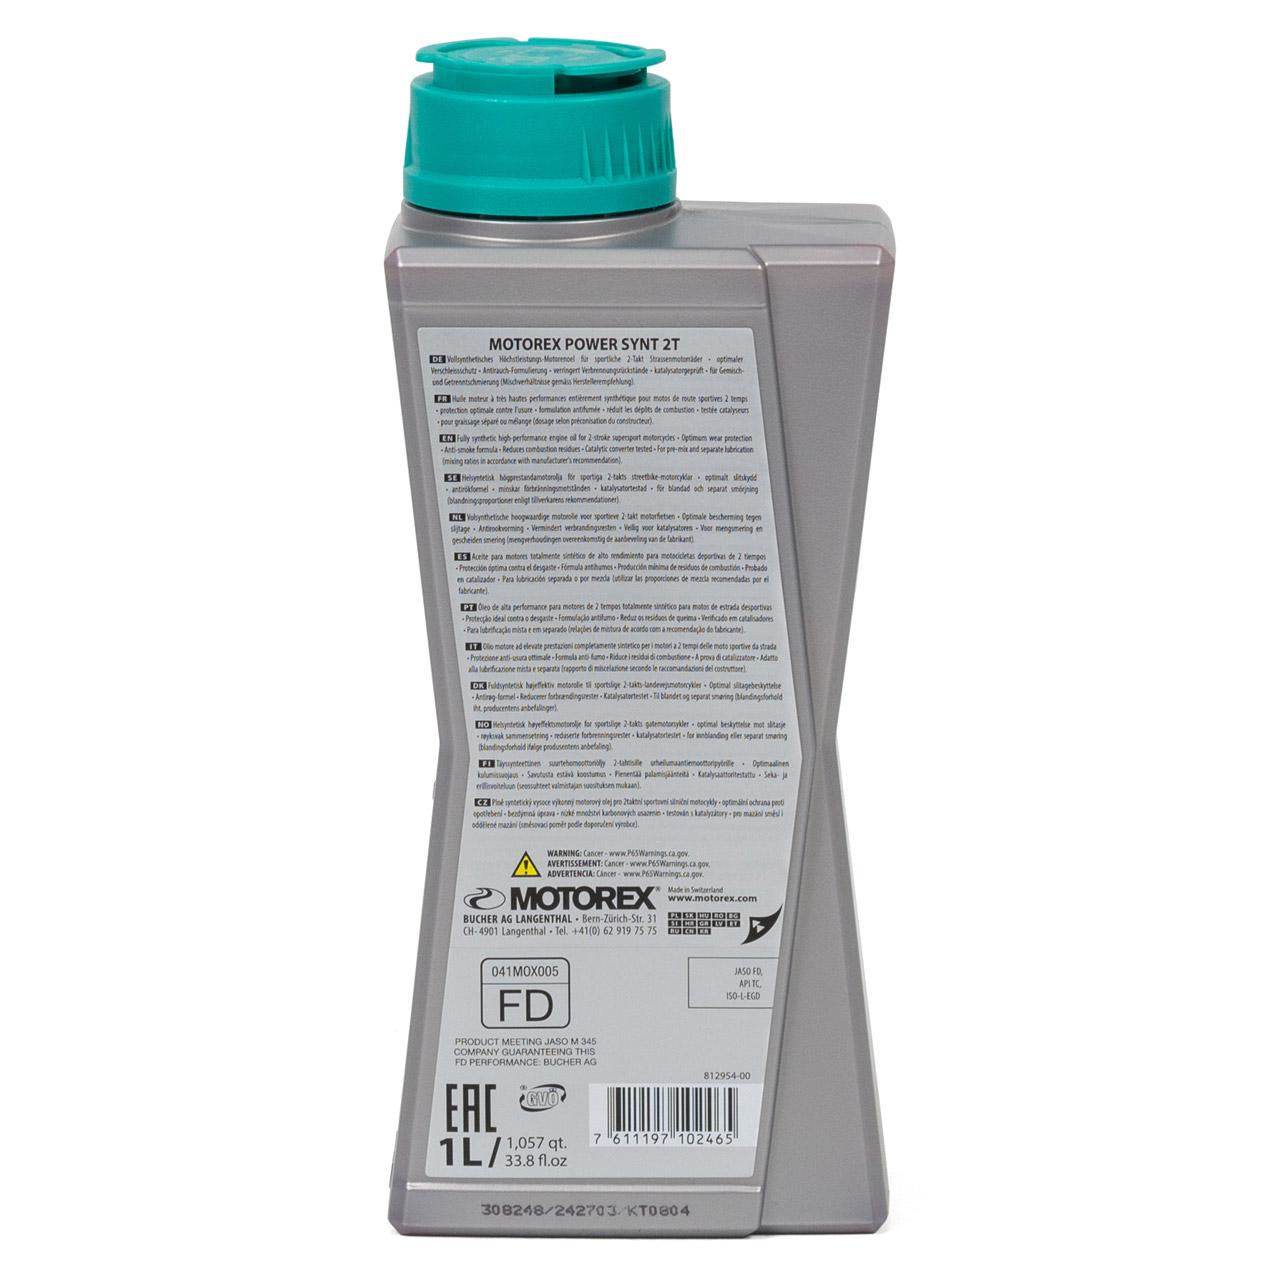 MOTOREX Power Synt 2T LOW SMOKE Motoröl API TC JASO FD ISO-L-EGD - 1L 1 Liter